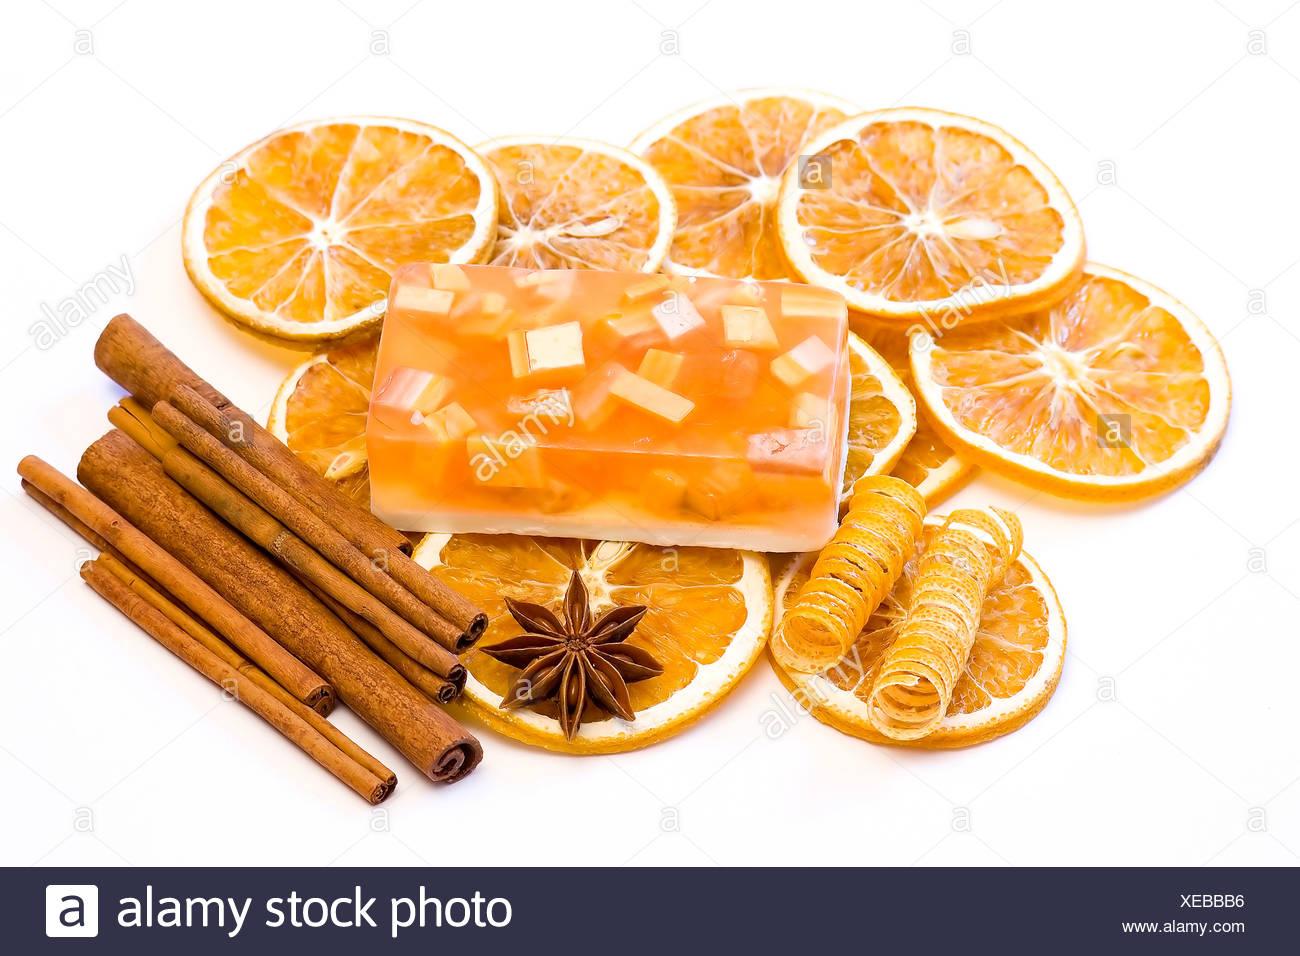 aromatic glycerin soap - Stock Image